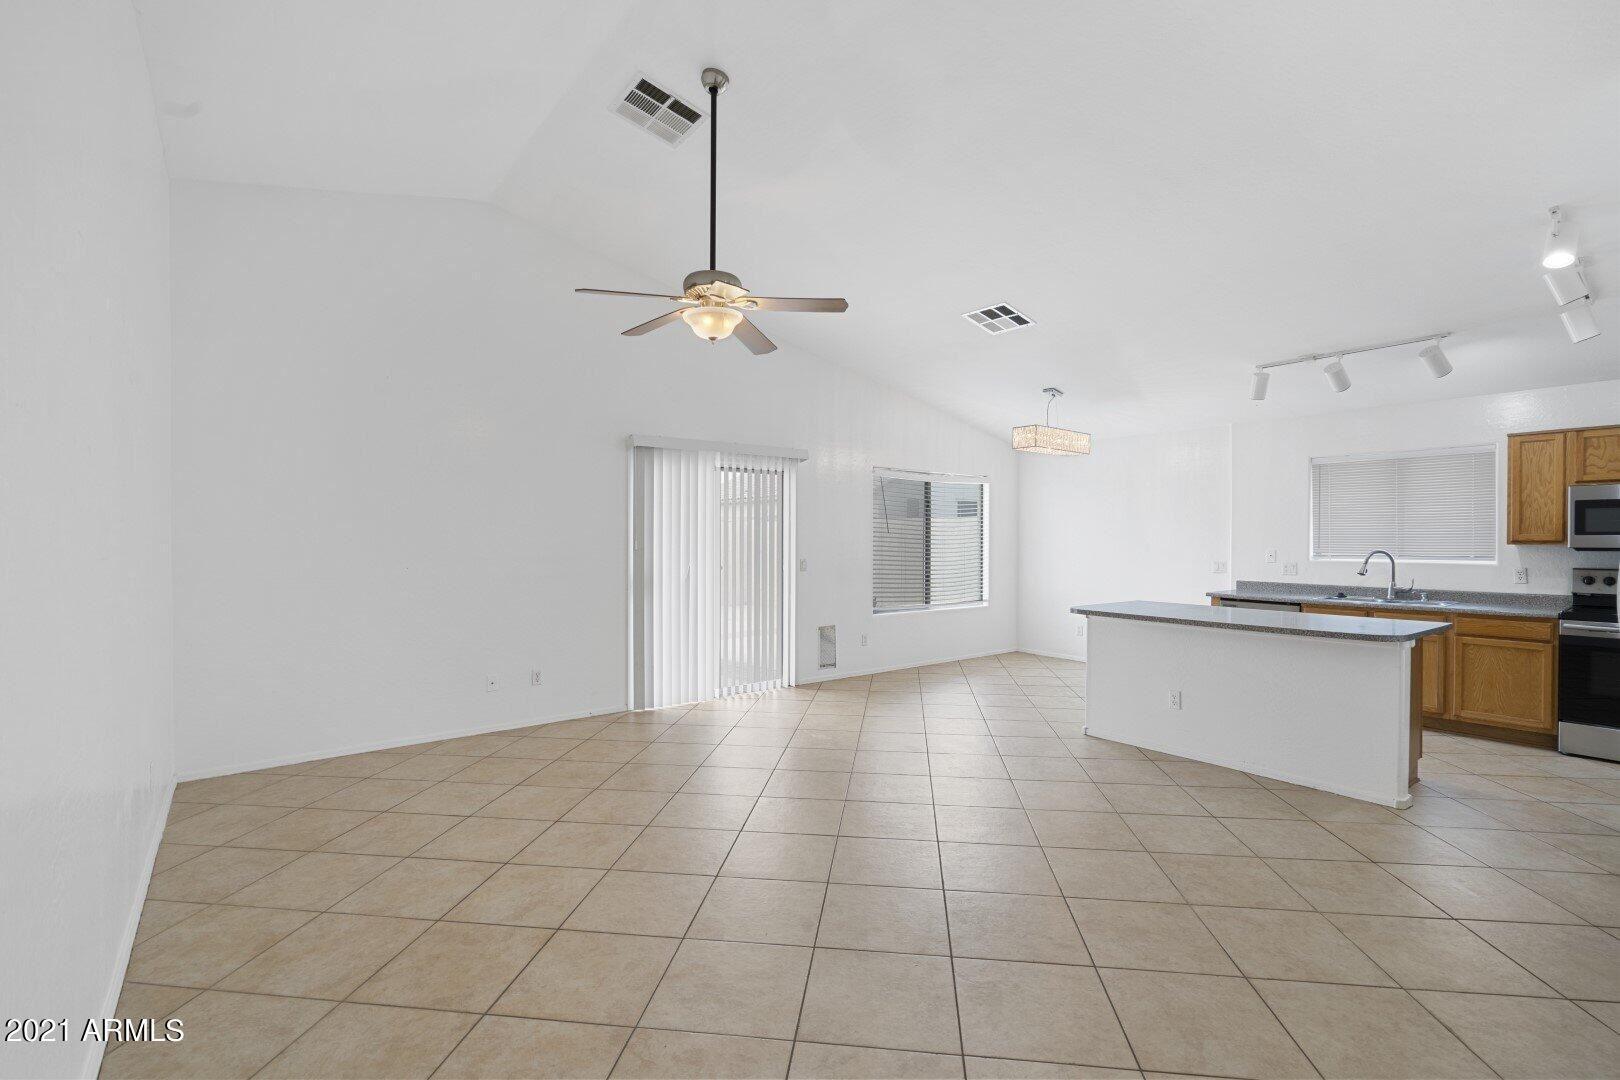 Photo of 8622 N 69TH Drive, Peoria, AZ 85345 (MLS # 6295799)